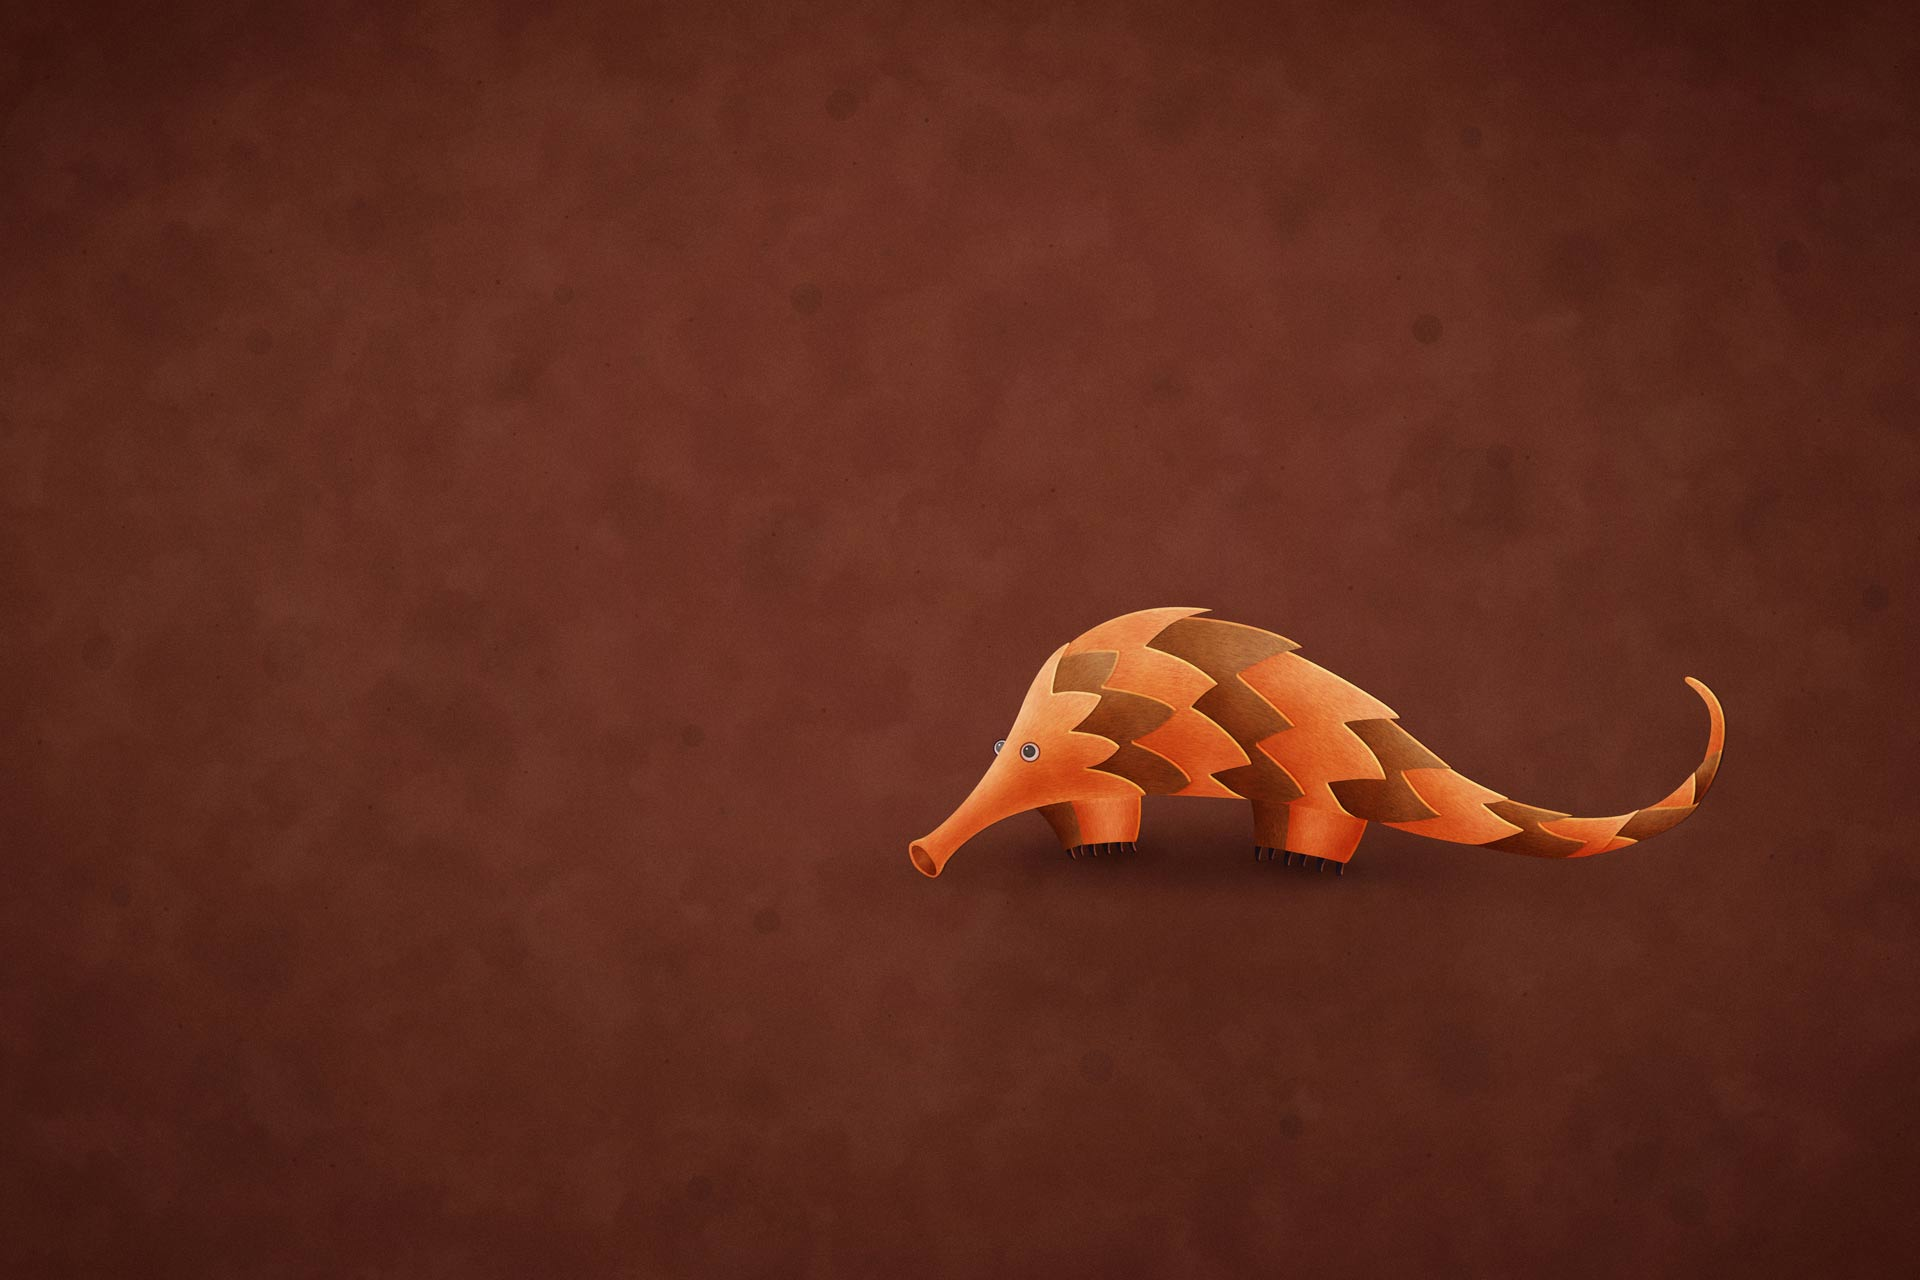 ubuntu precise pangolin wallpaper - photo #16